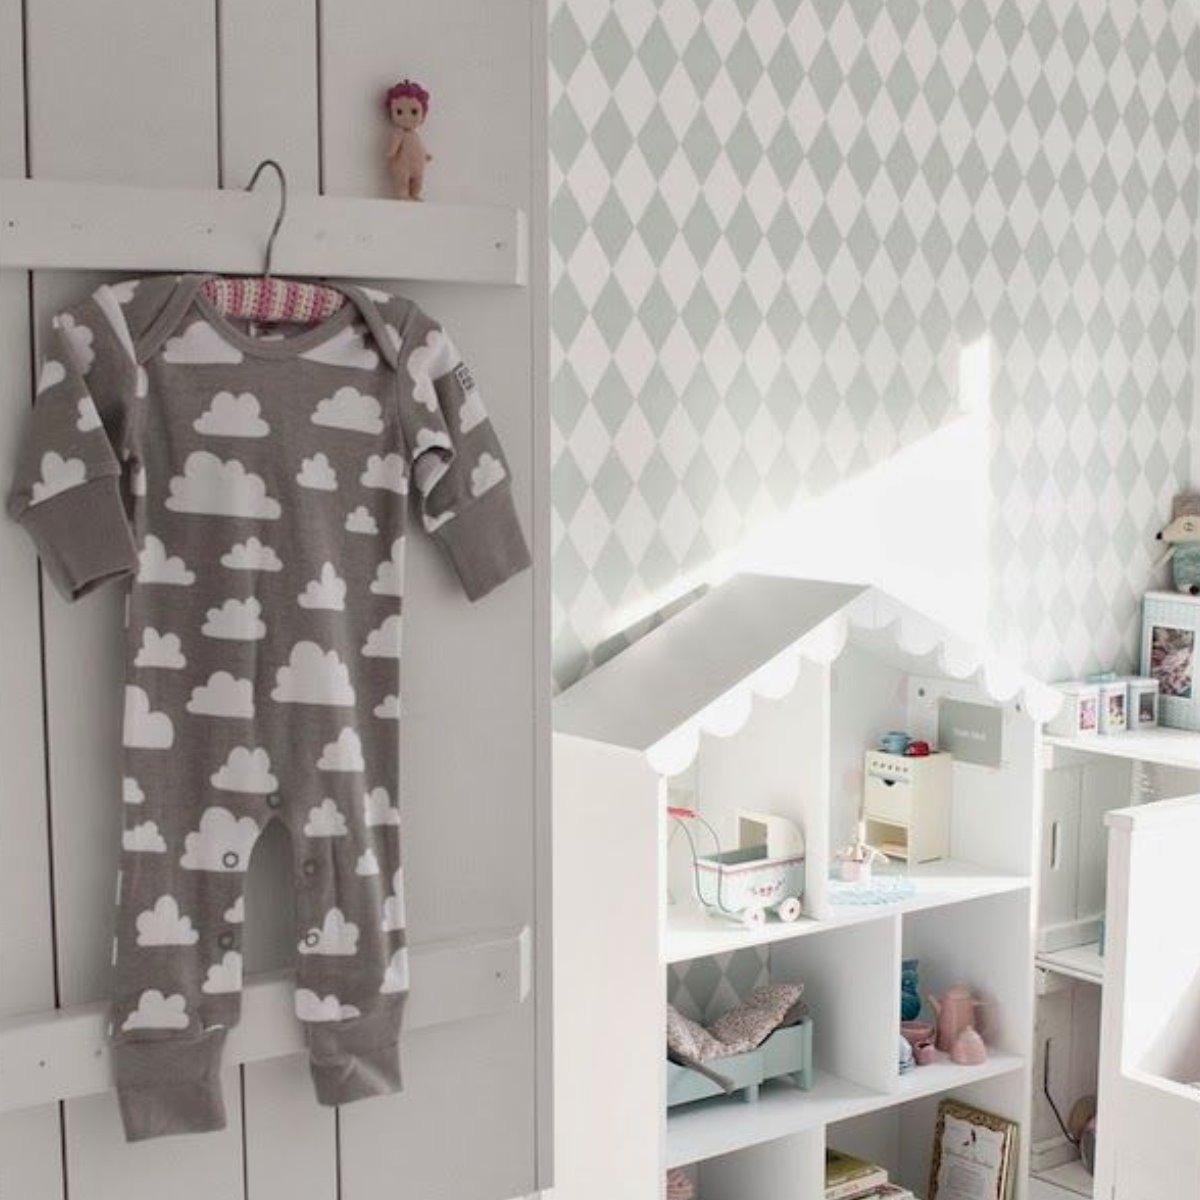 Papel de parede cinza adesivo vin lico infantil beb menino r 47 90 em mercado livre - Papel vinilico para paredes ...